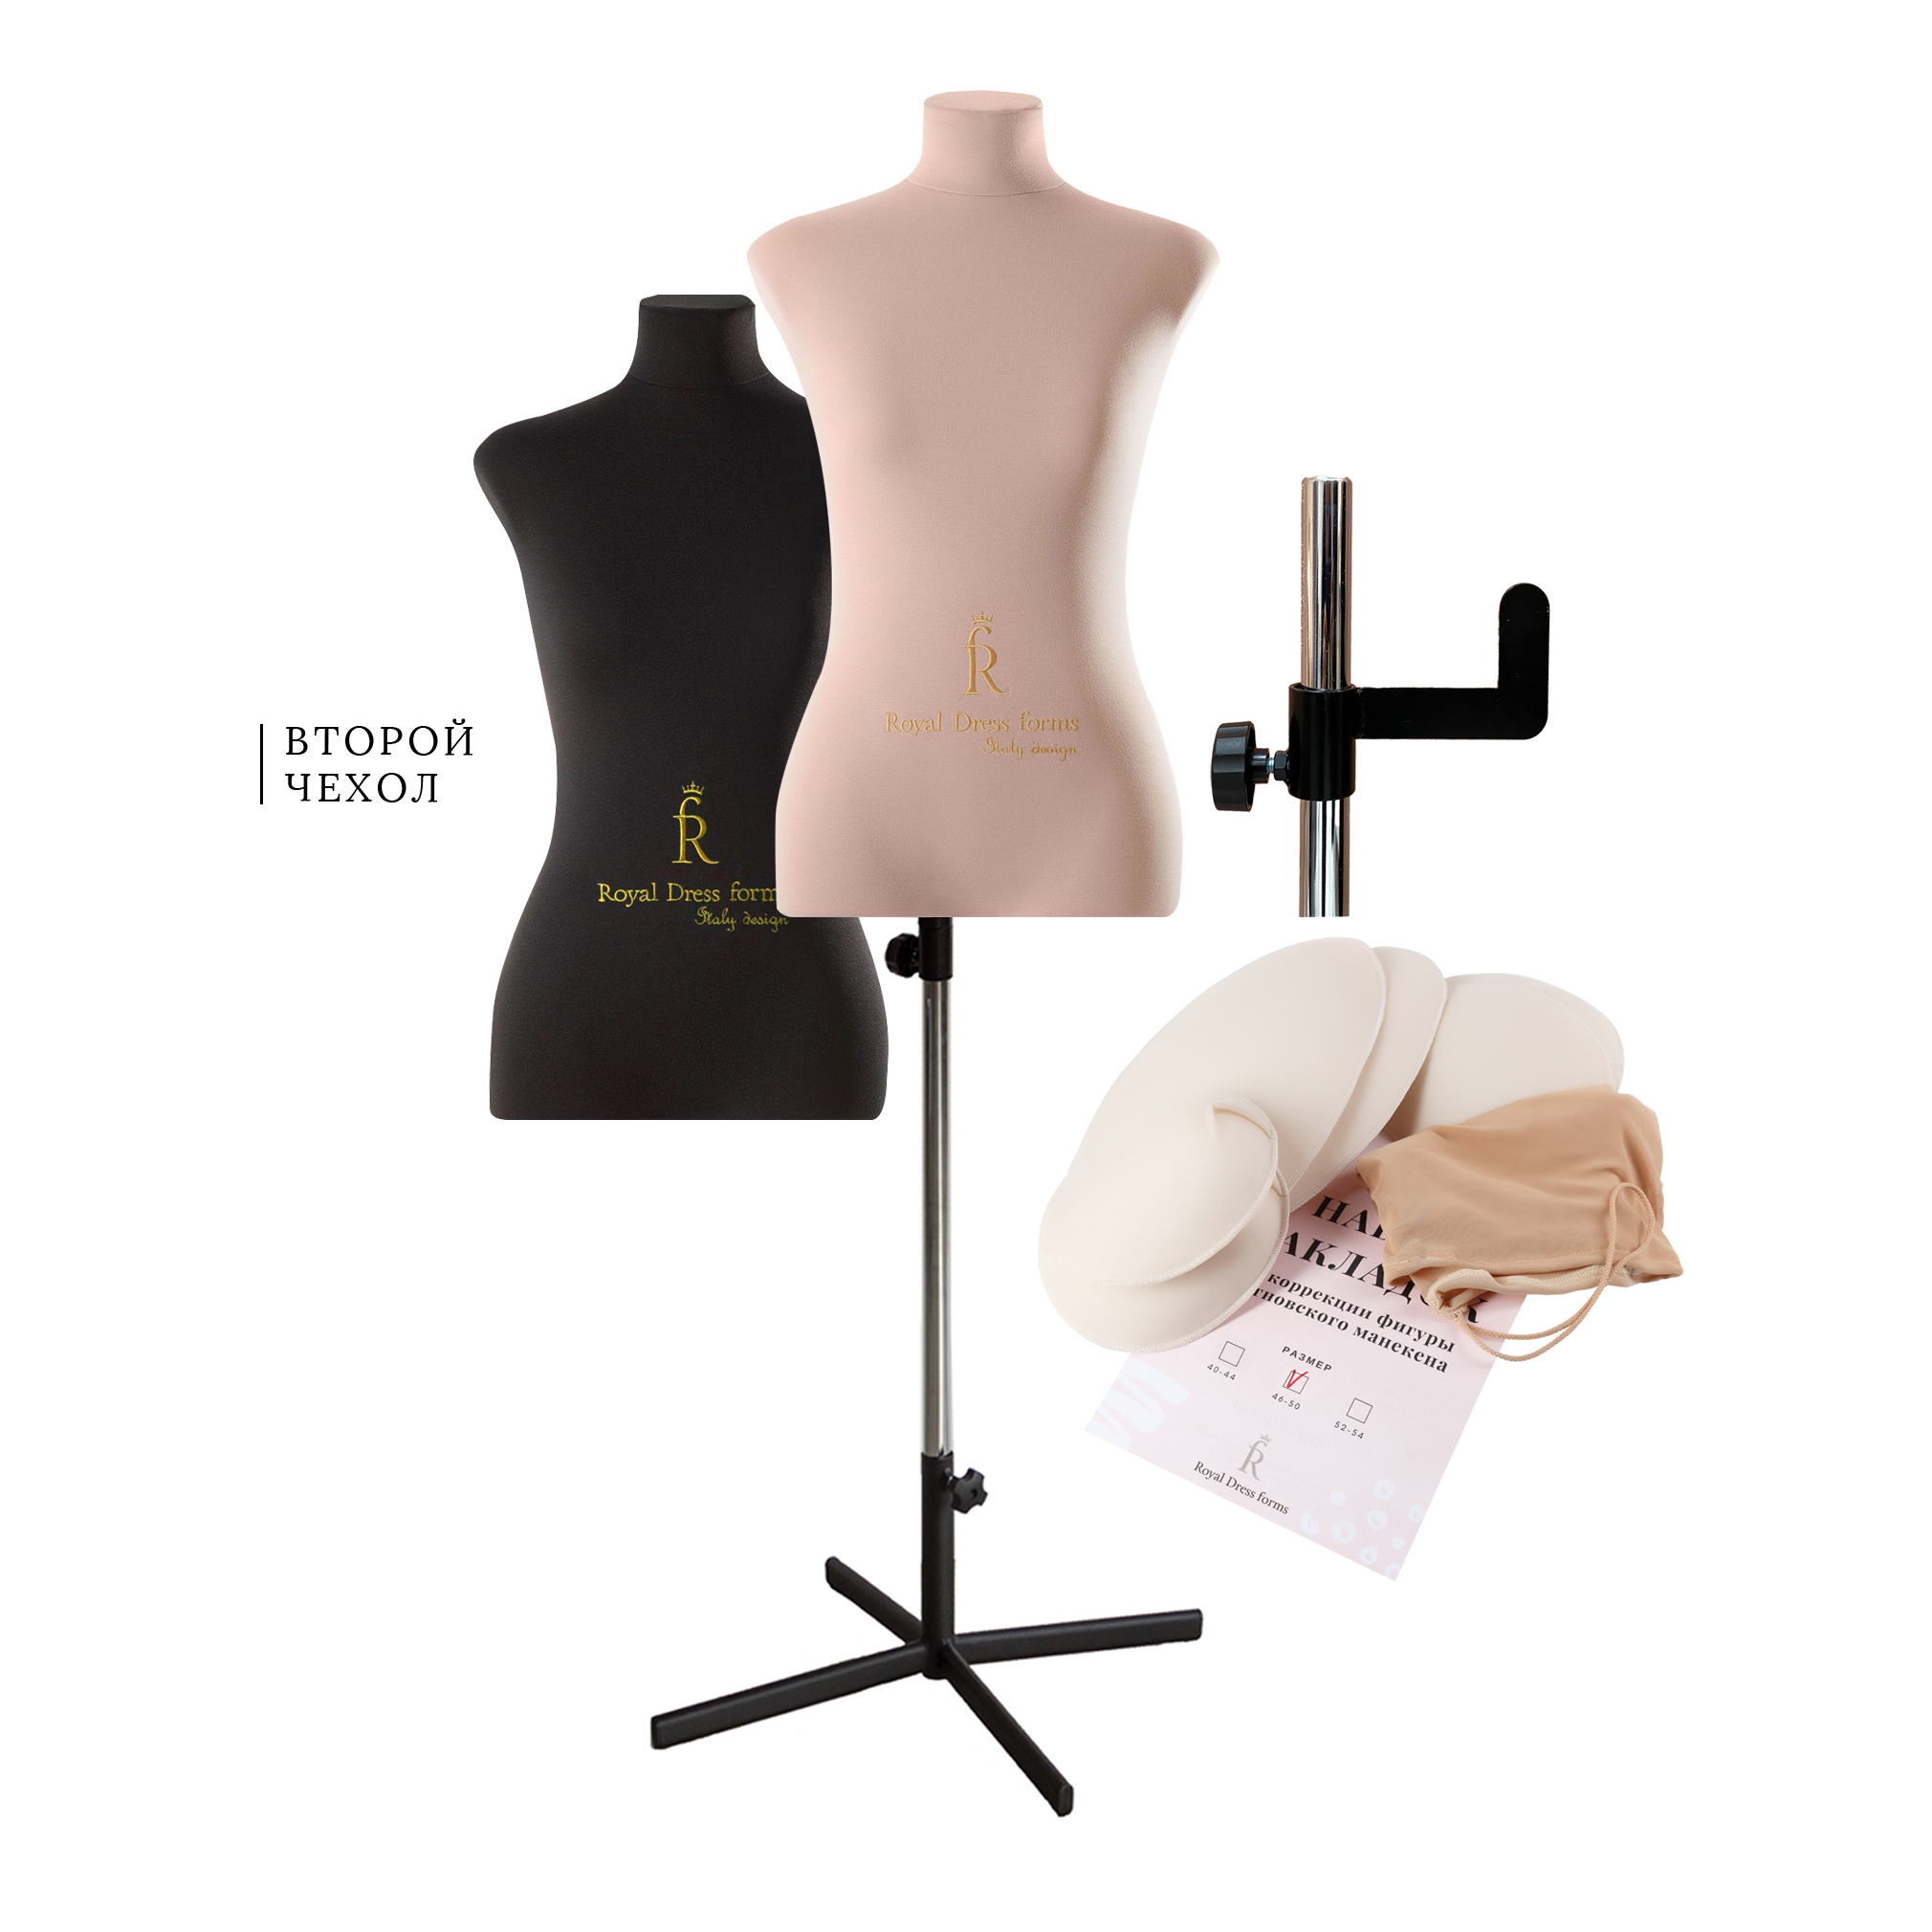 Манекен портновский Кристина, комплект Про, размер 44,  цвет бежевый, в комплекте набор накладок и подставка